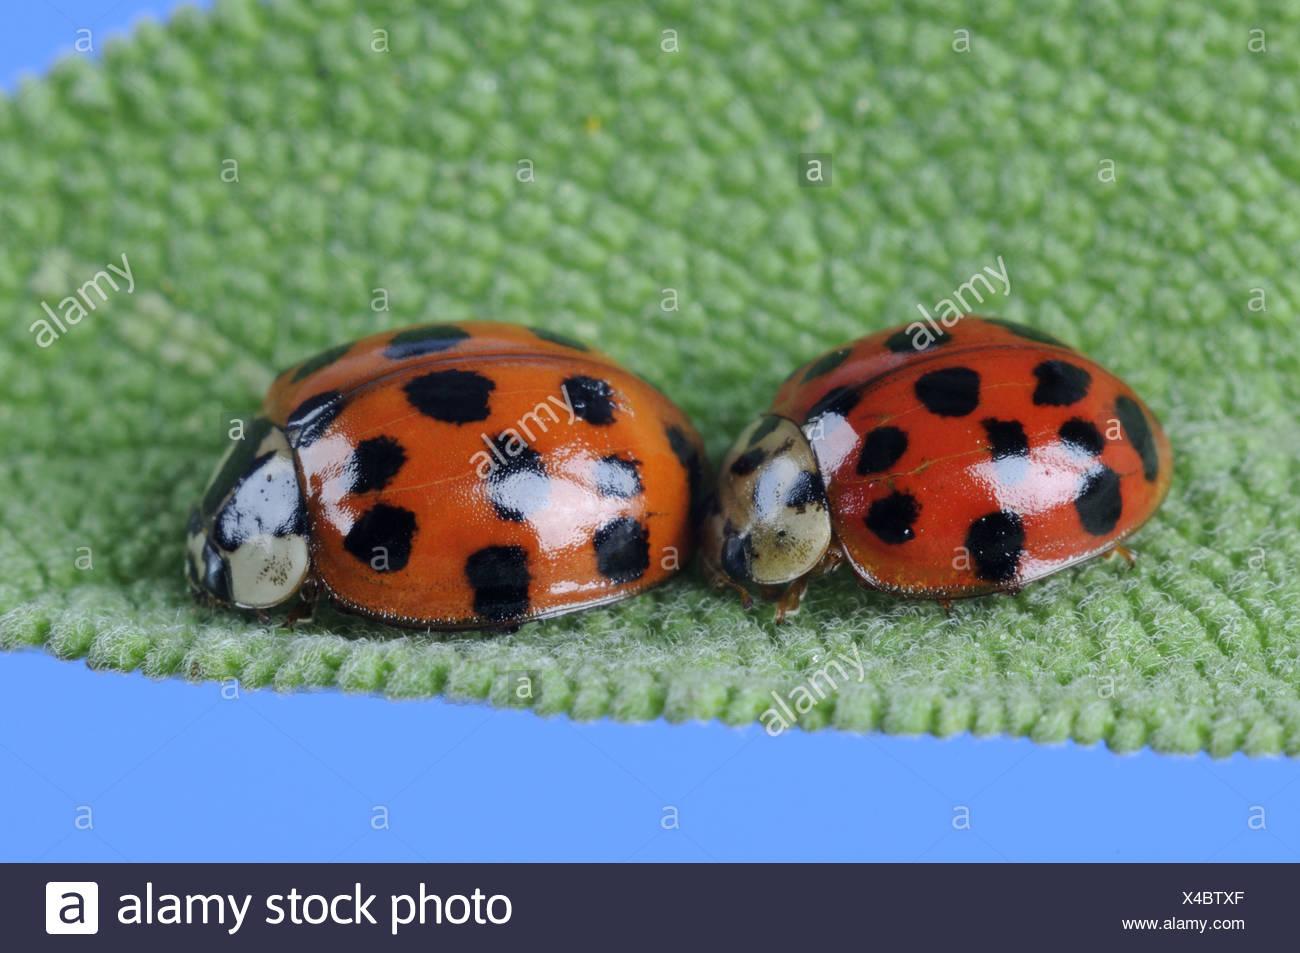 Asian lady beetle Stock Photo